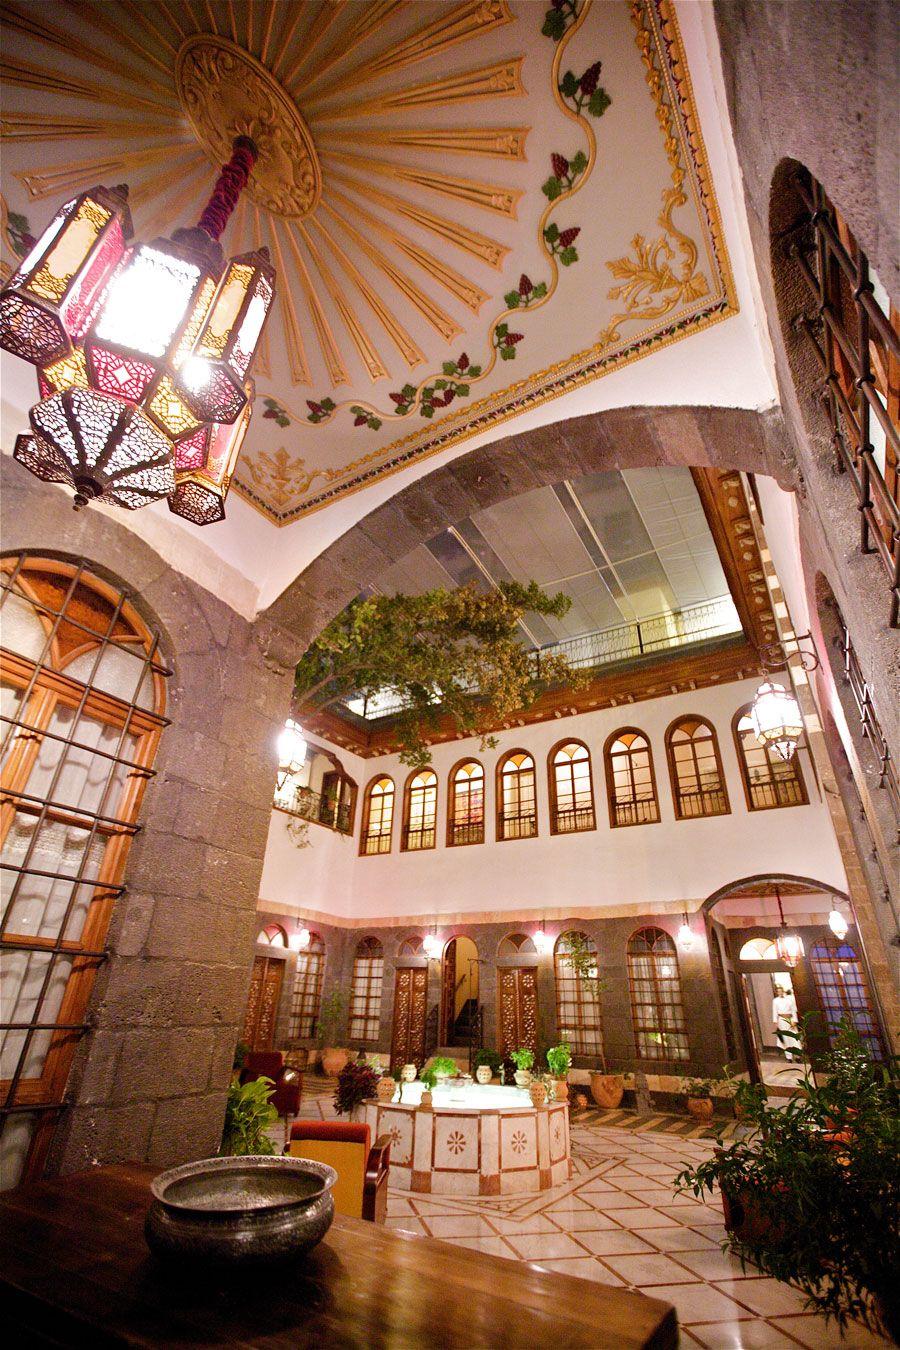 Courtyard Beit Zafran Hotel De Charme Damascus Syria With